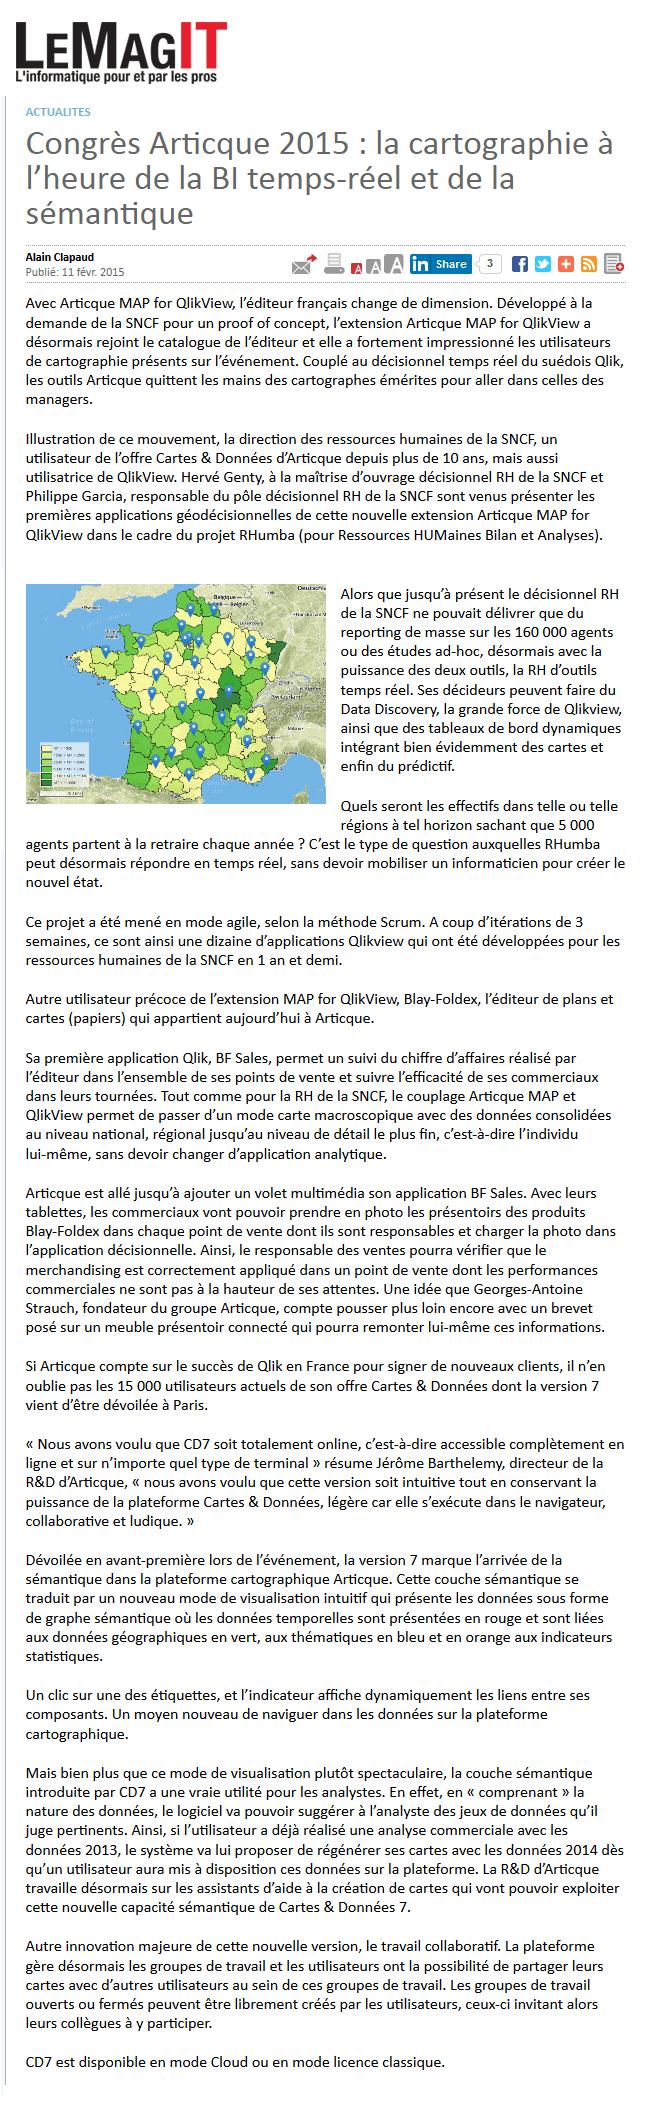 Le mag IT_congrès 2015_11-02-2015